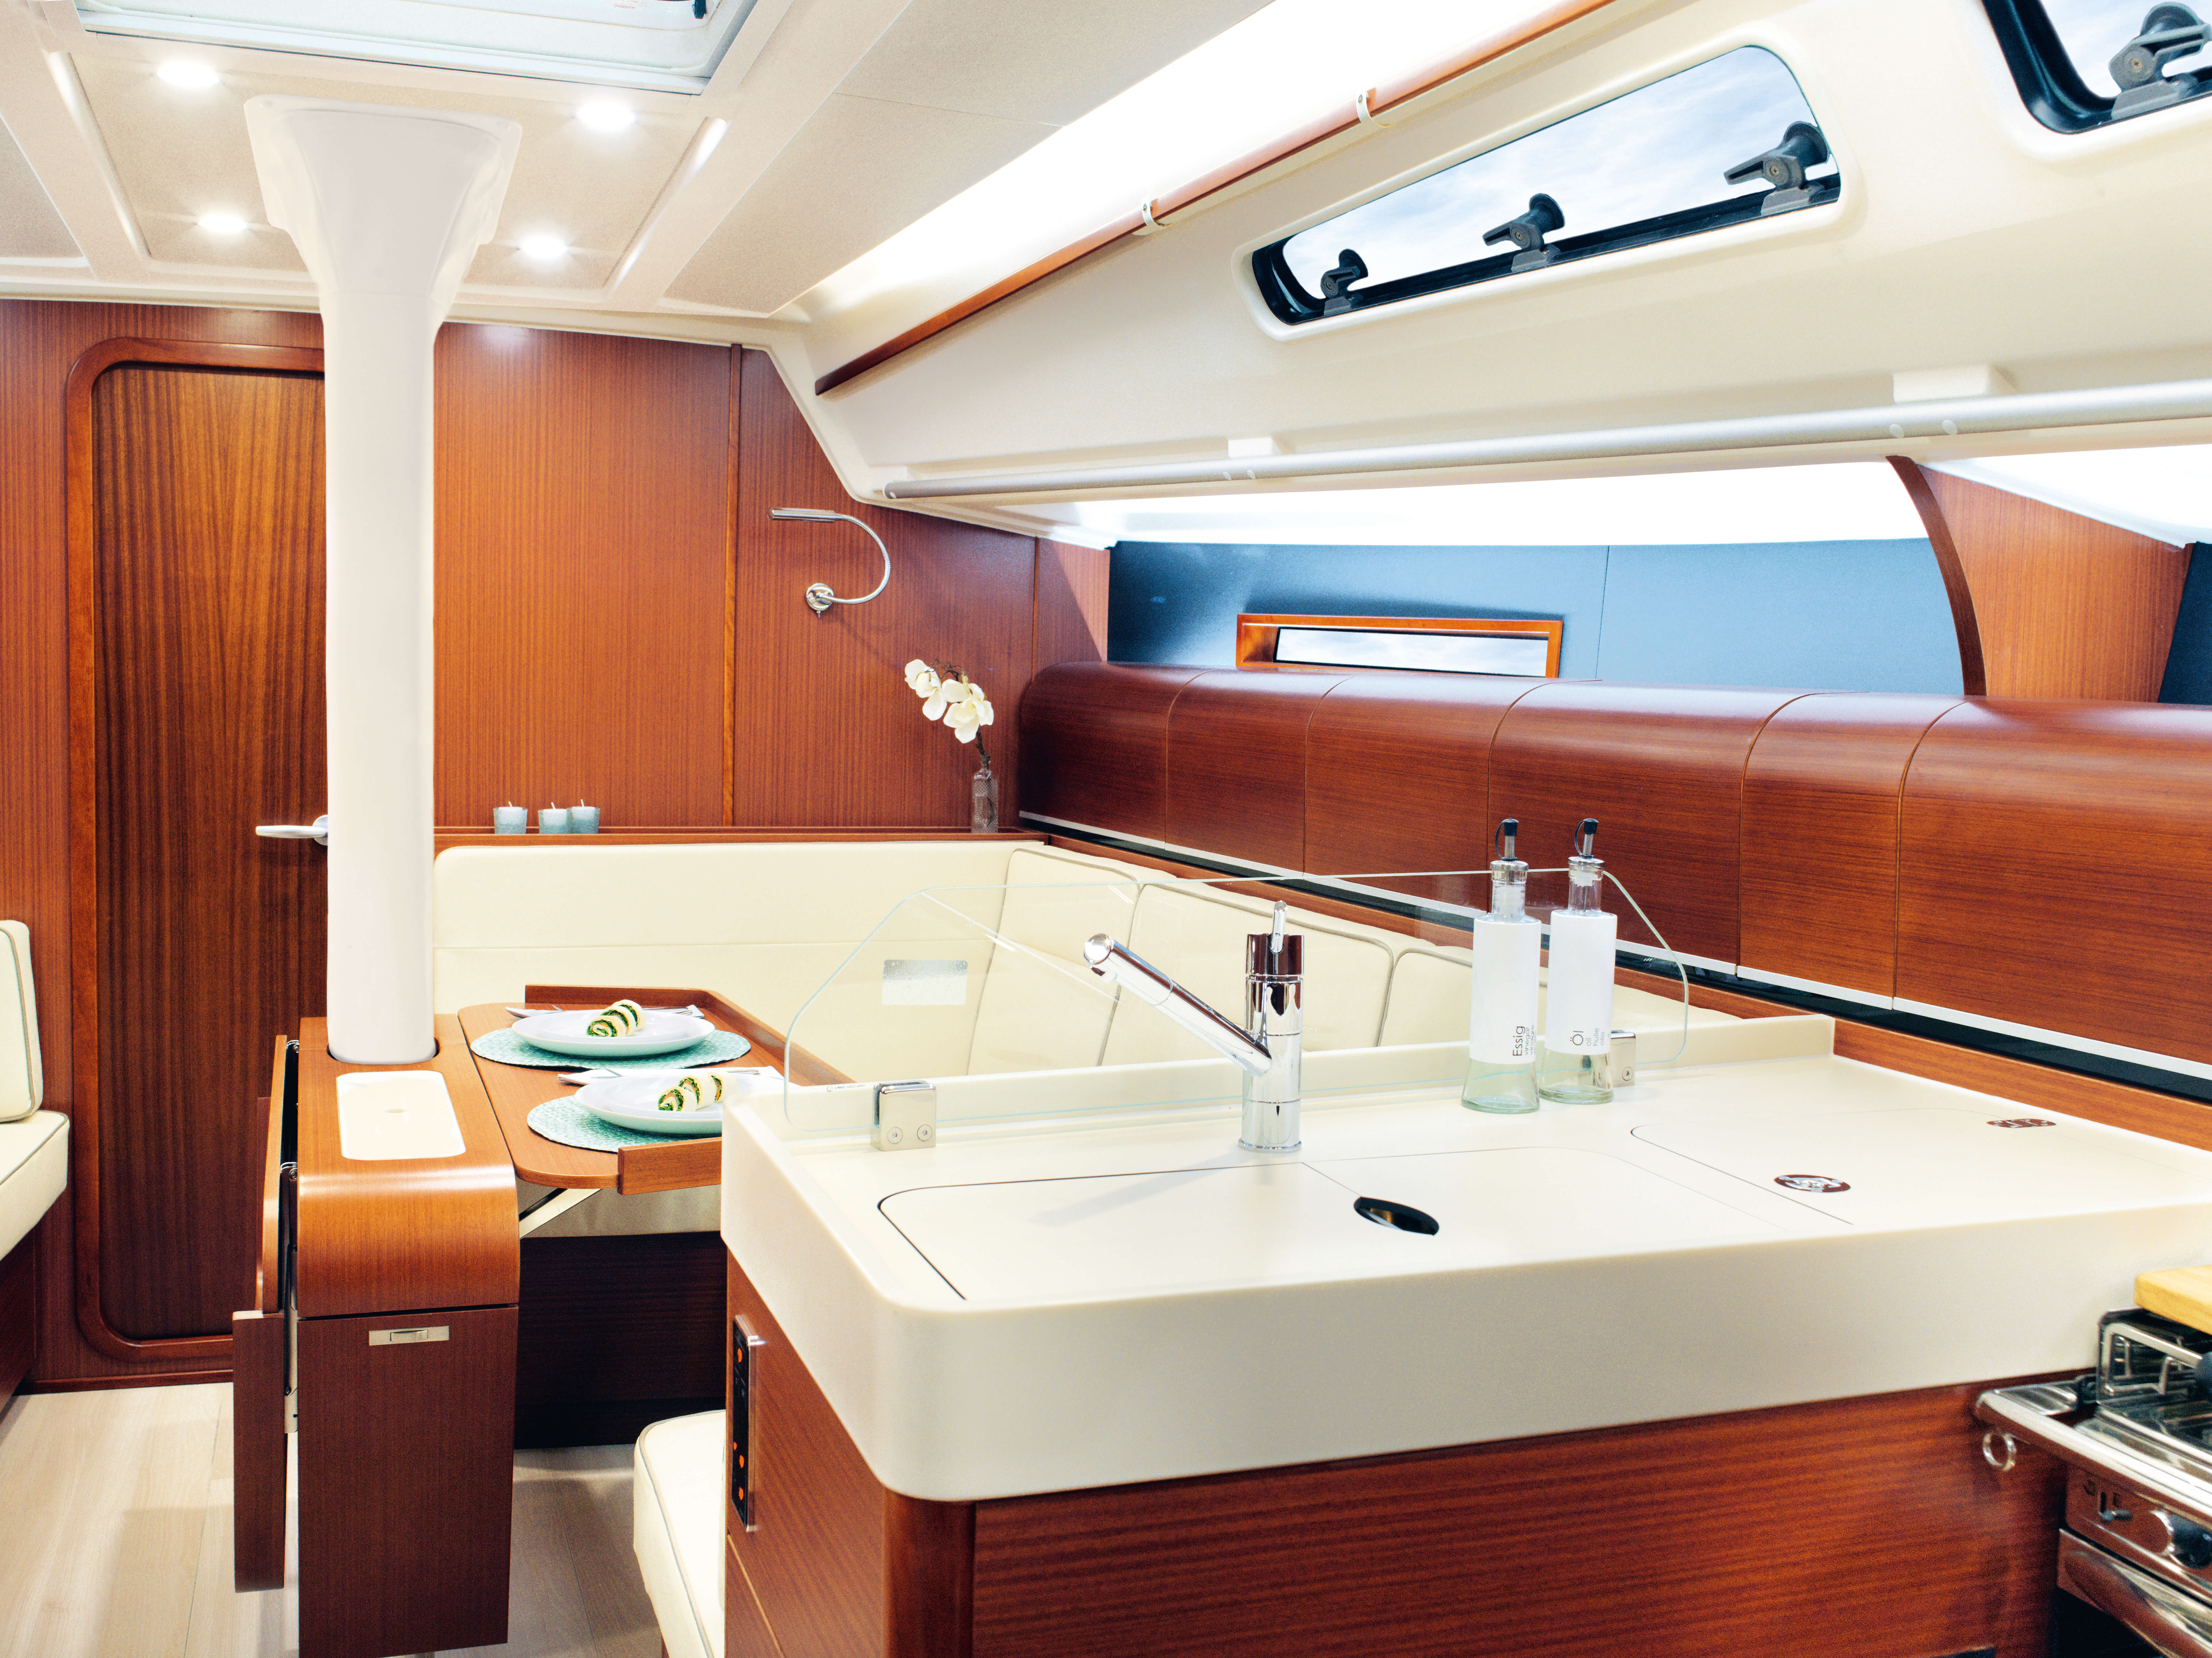 Dehler 42 Interior view pantry | sink cover, tap, foldable table | Dehler